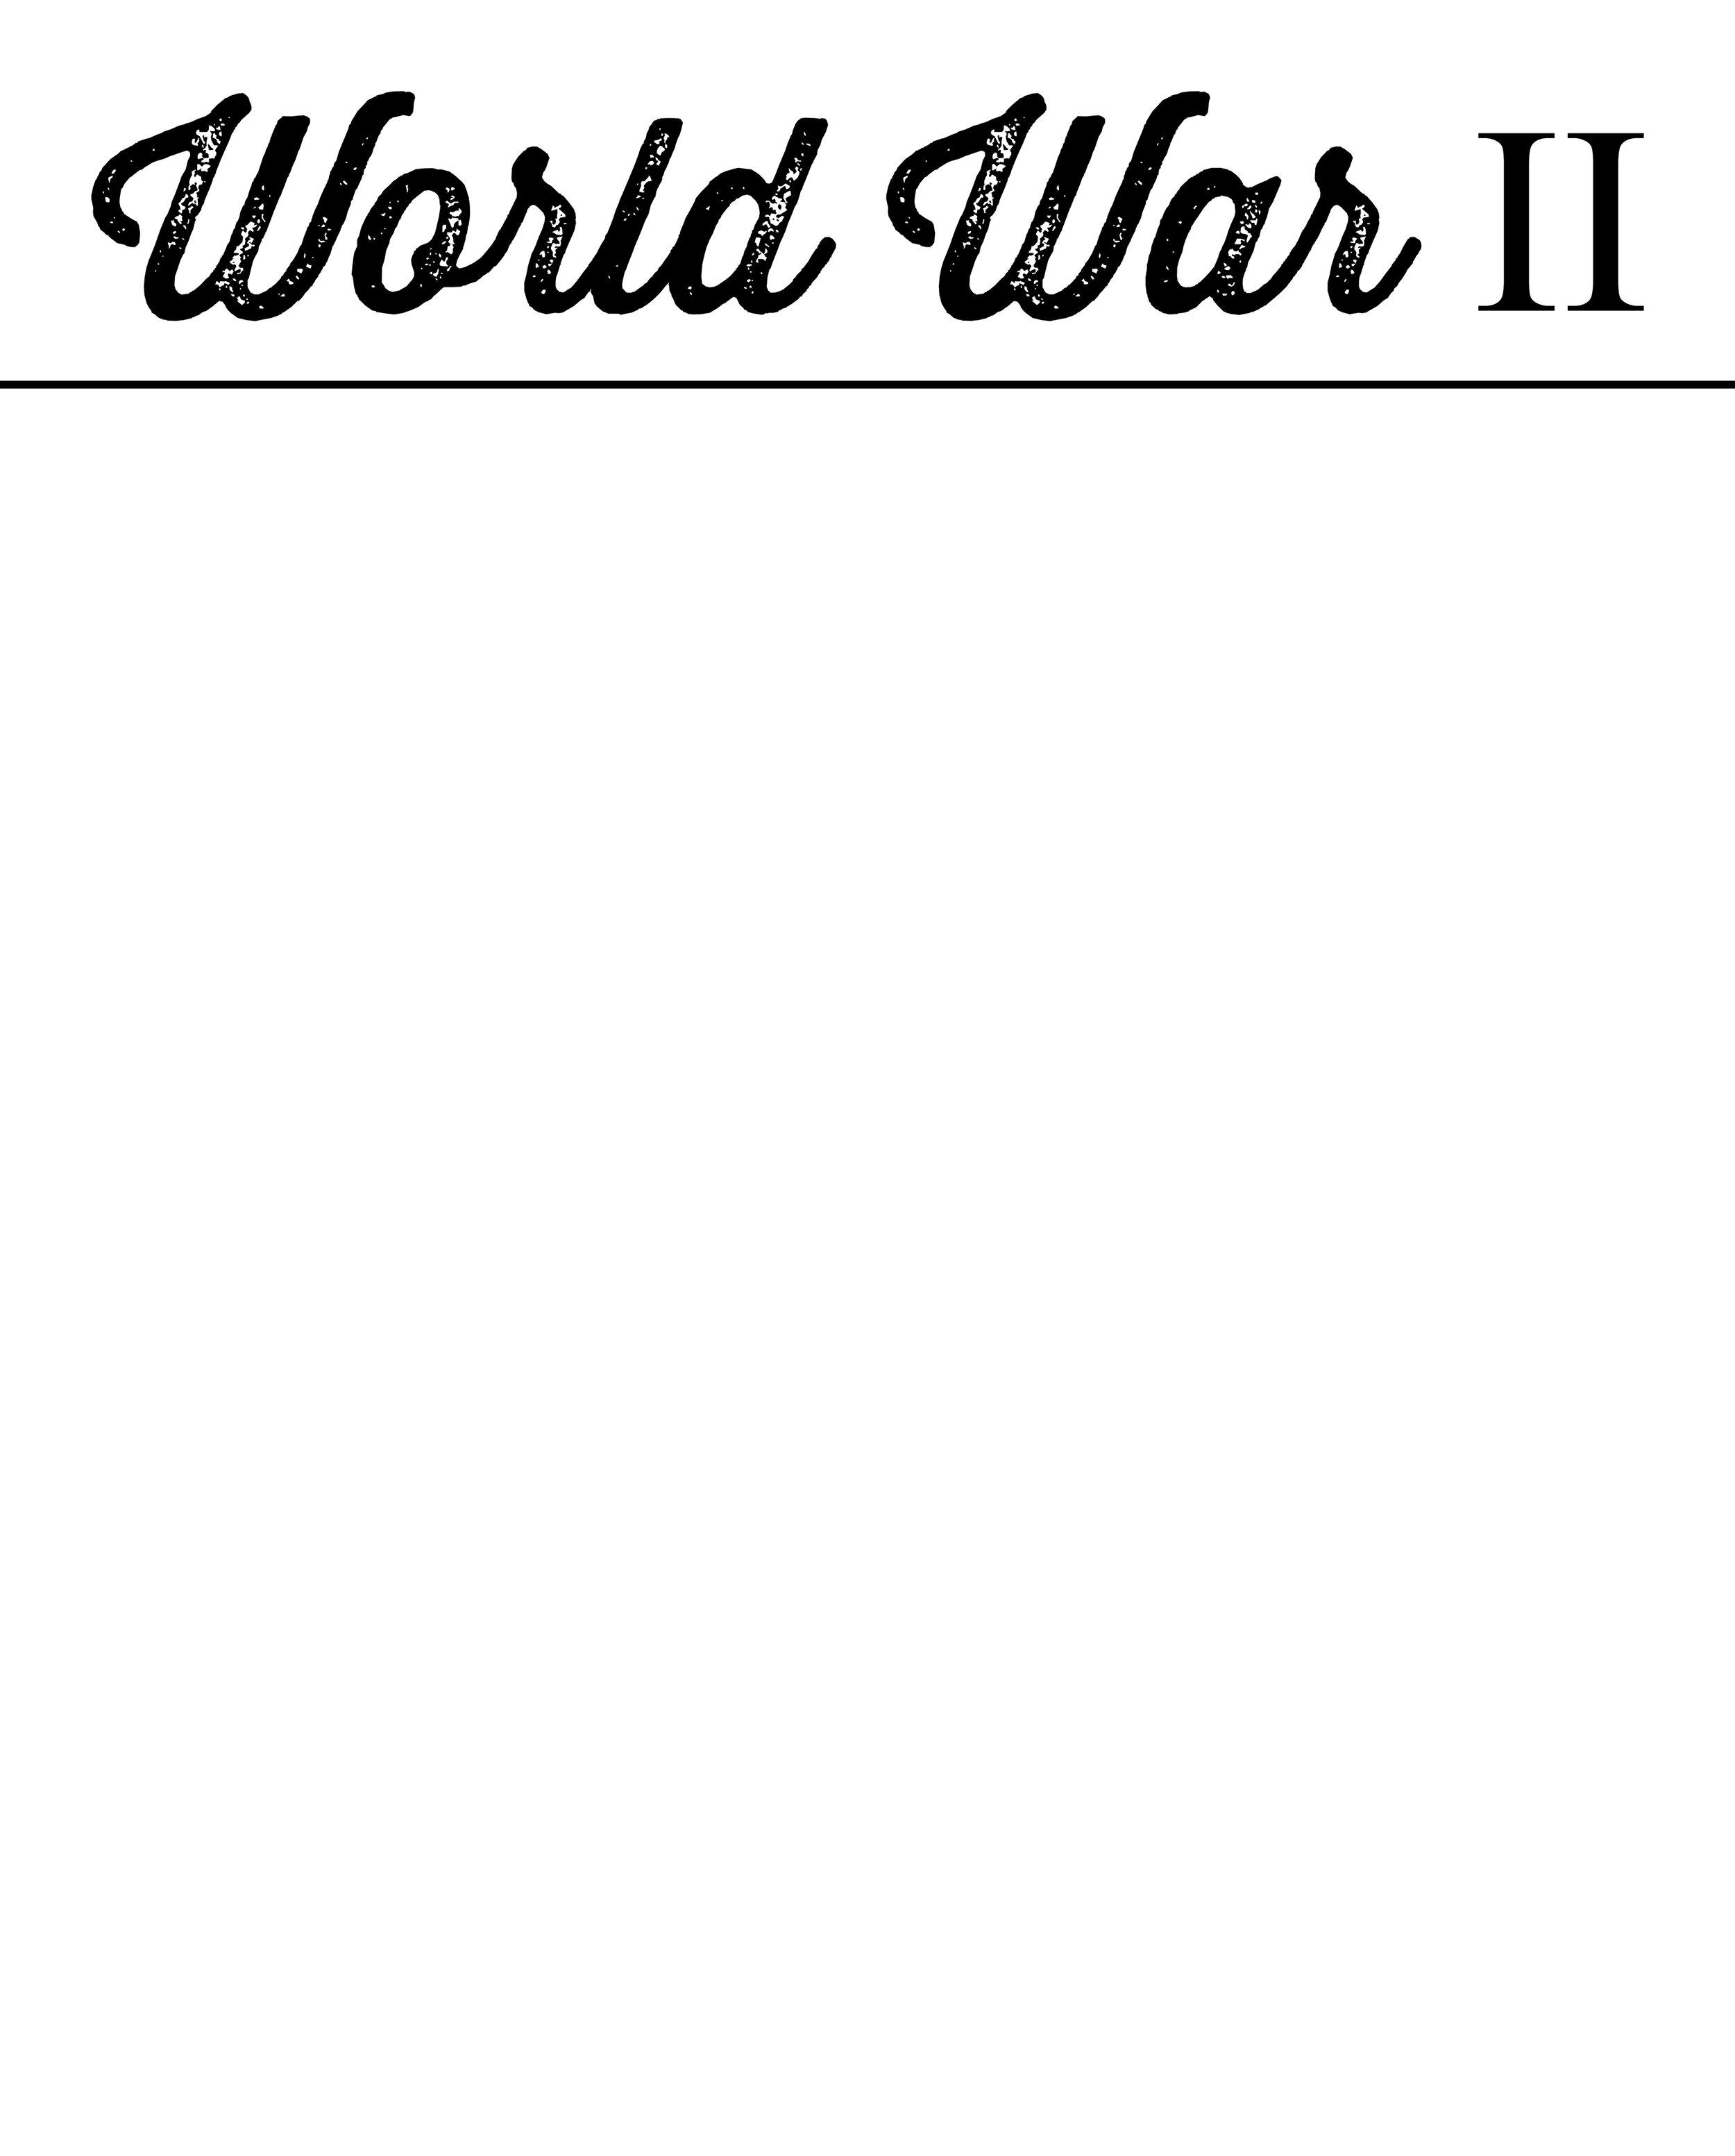 100. WorldWarII_8.5X11_BlankPoster.jpg